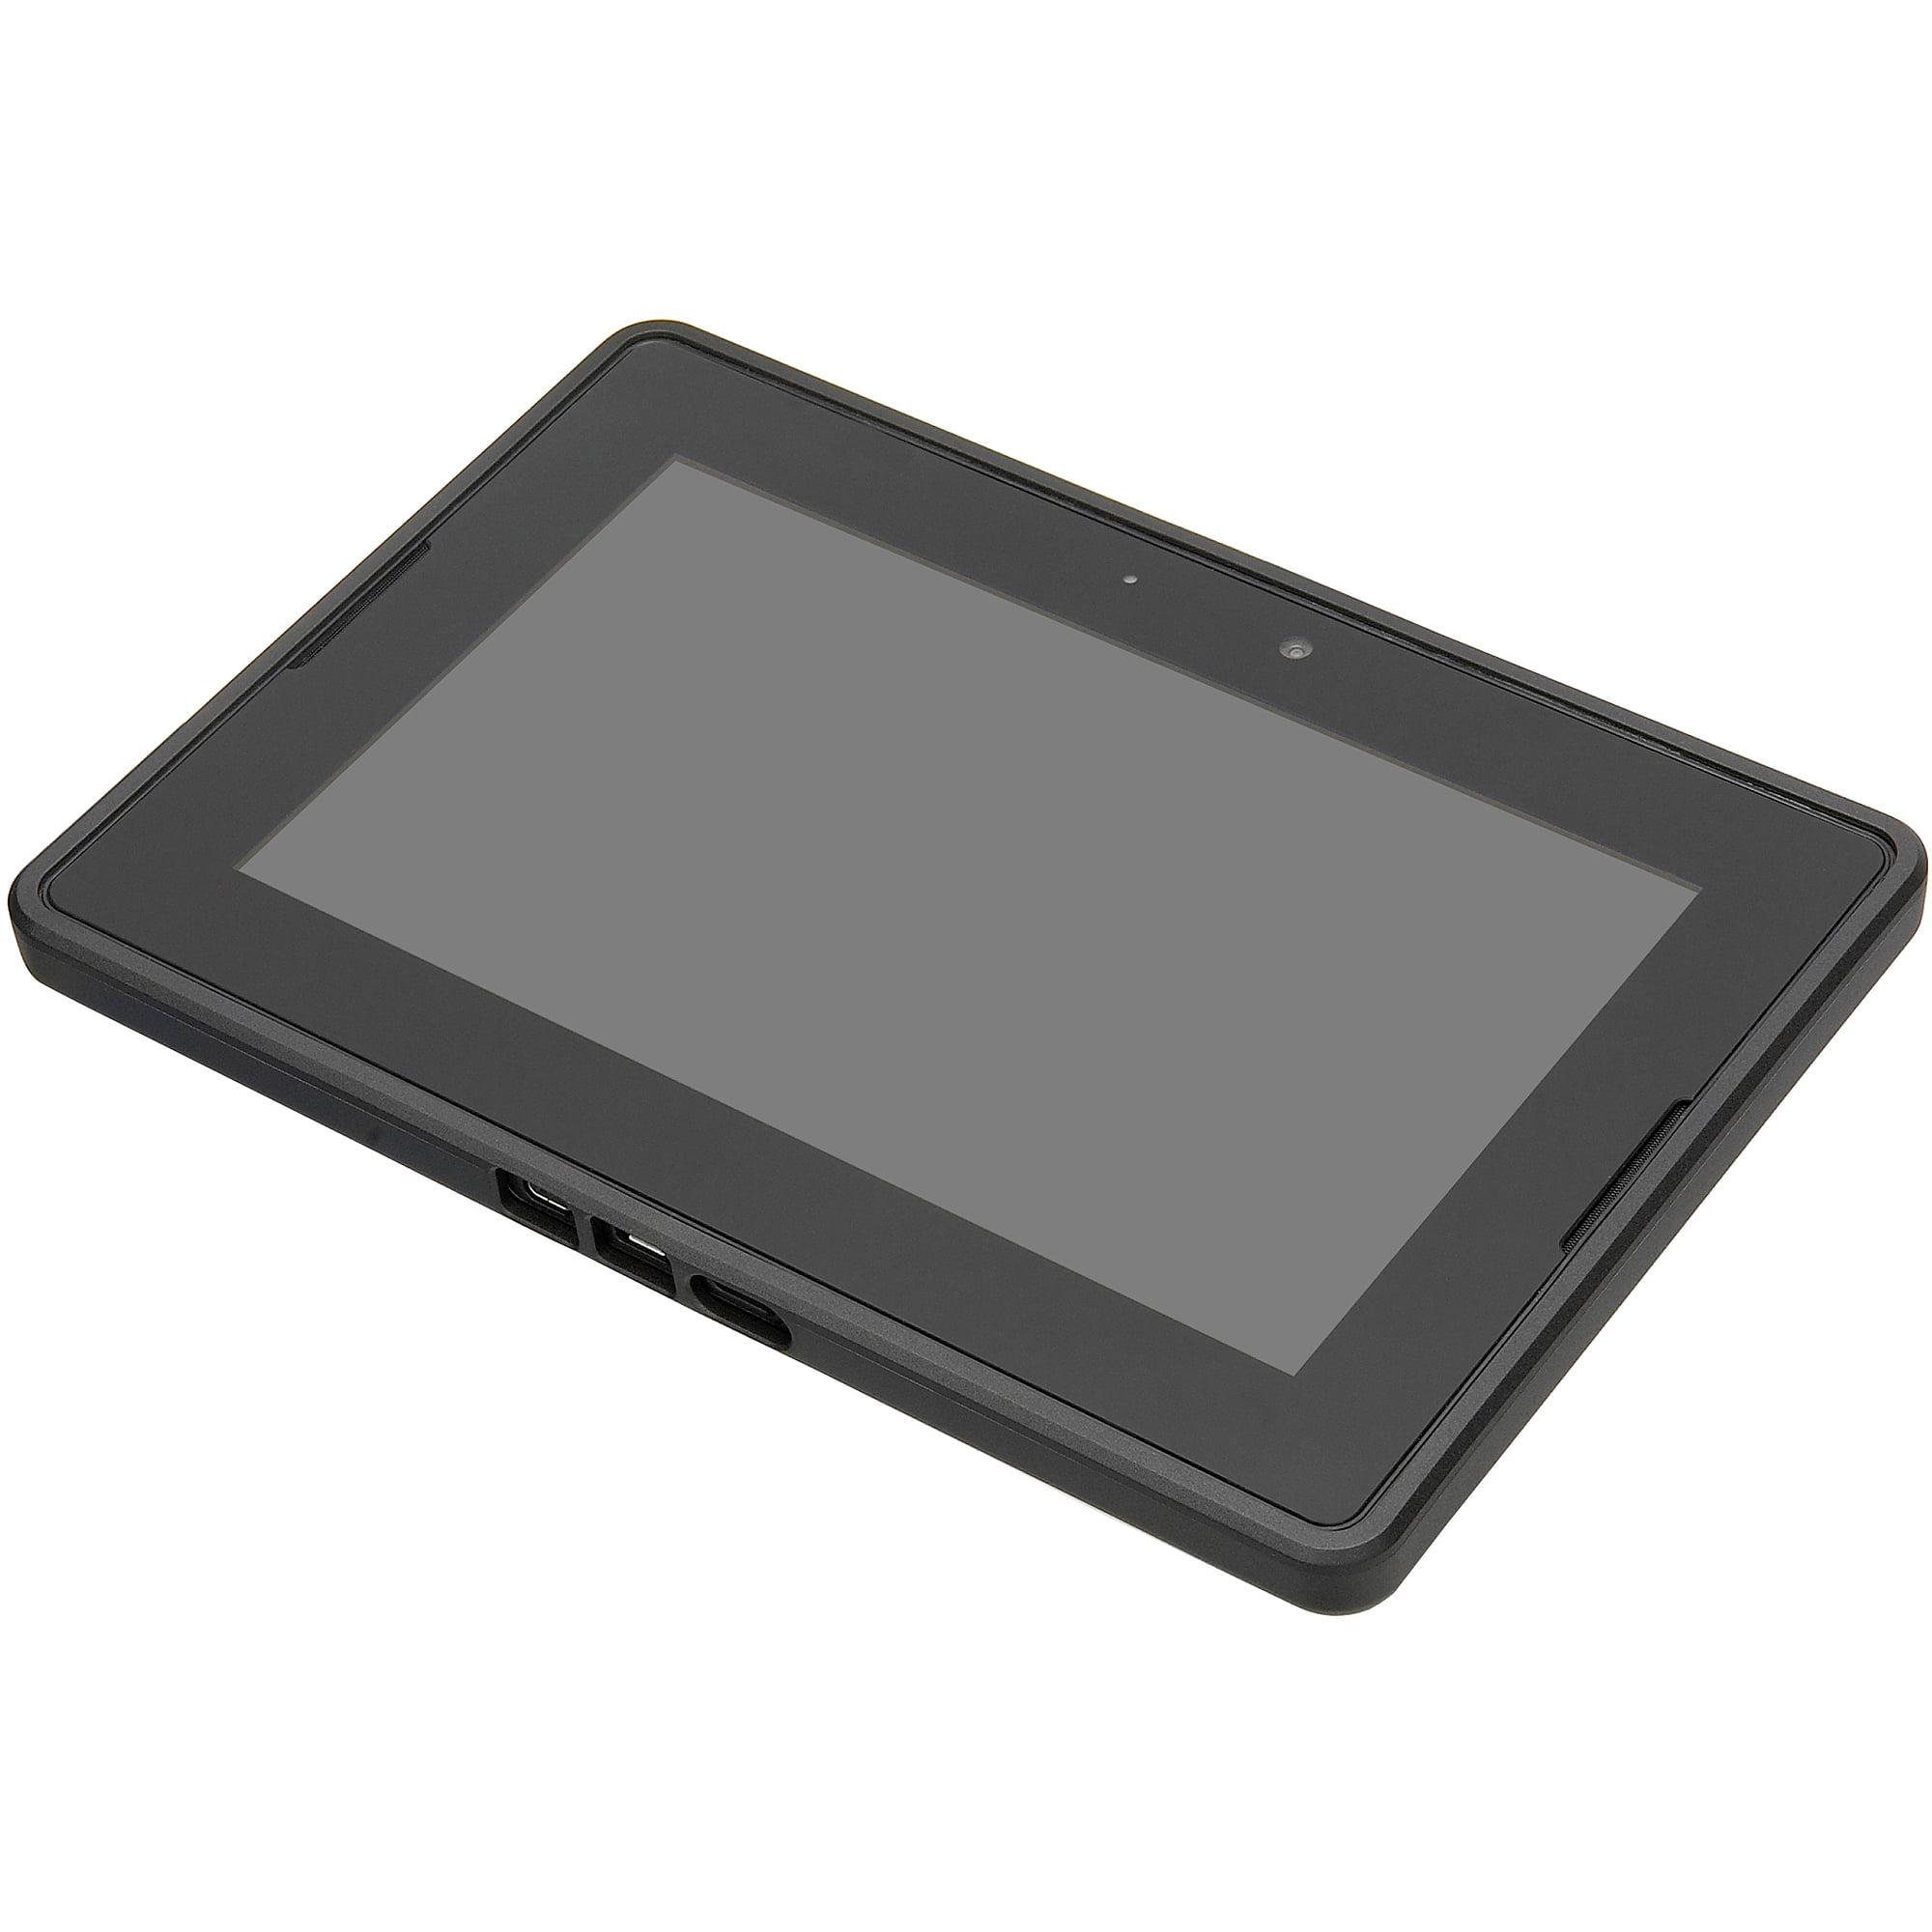 BlackBerry Skin for PlayBook Tablet